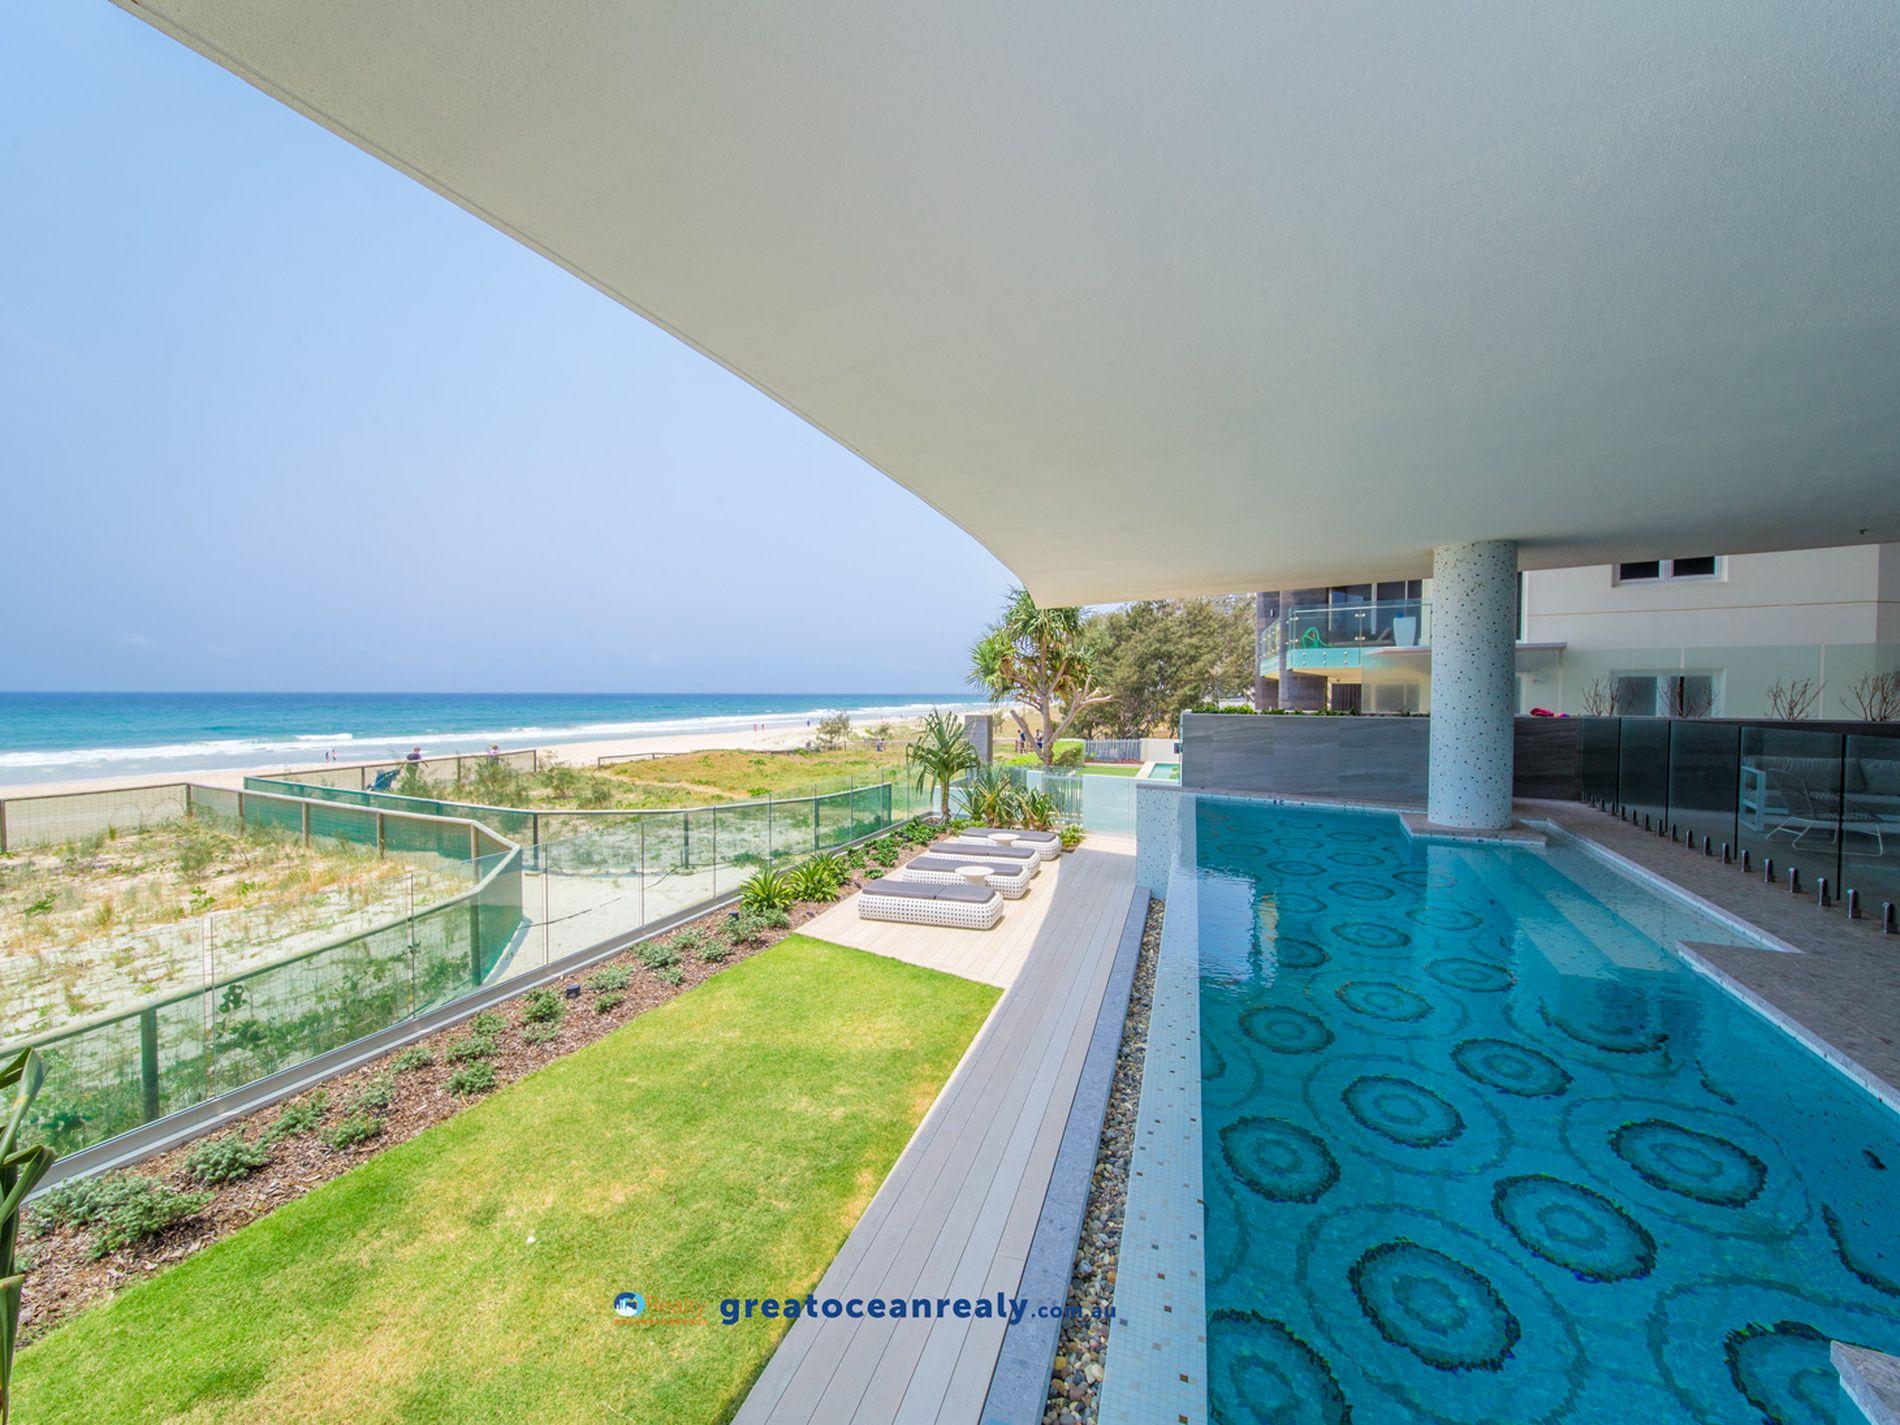 304 / 3 Northcliffe Terrace, Surfers Paradise